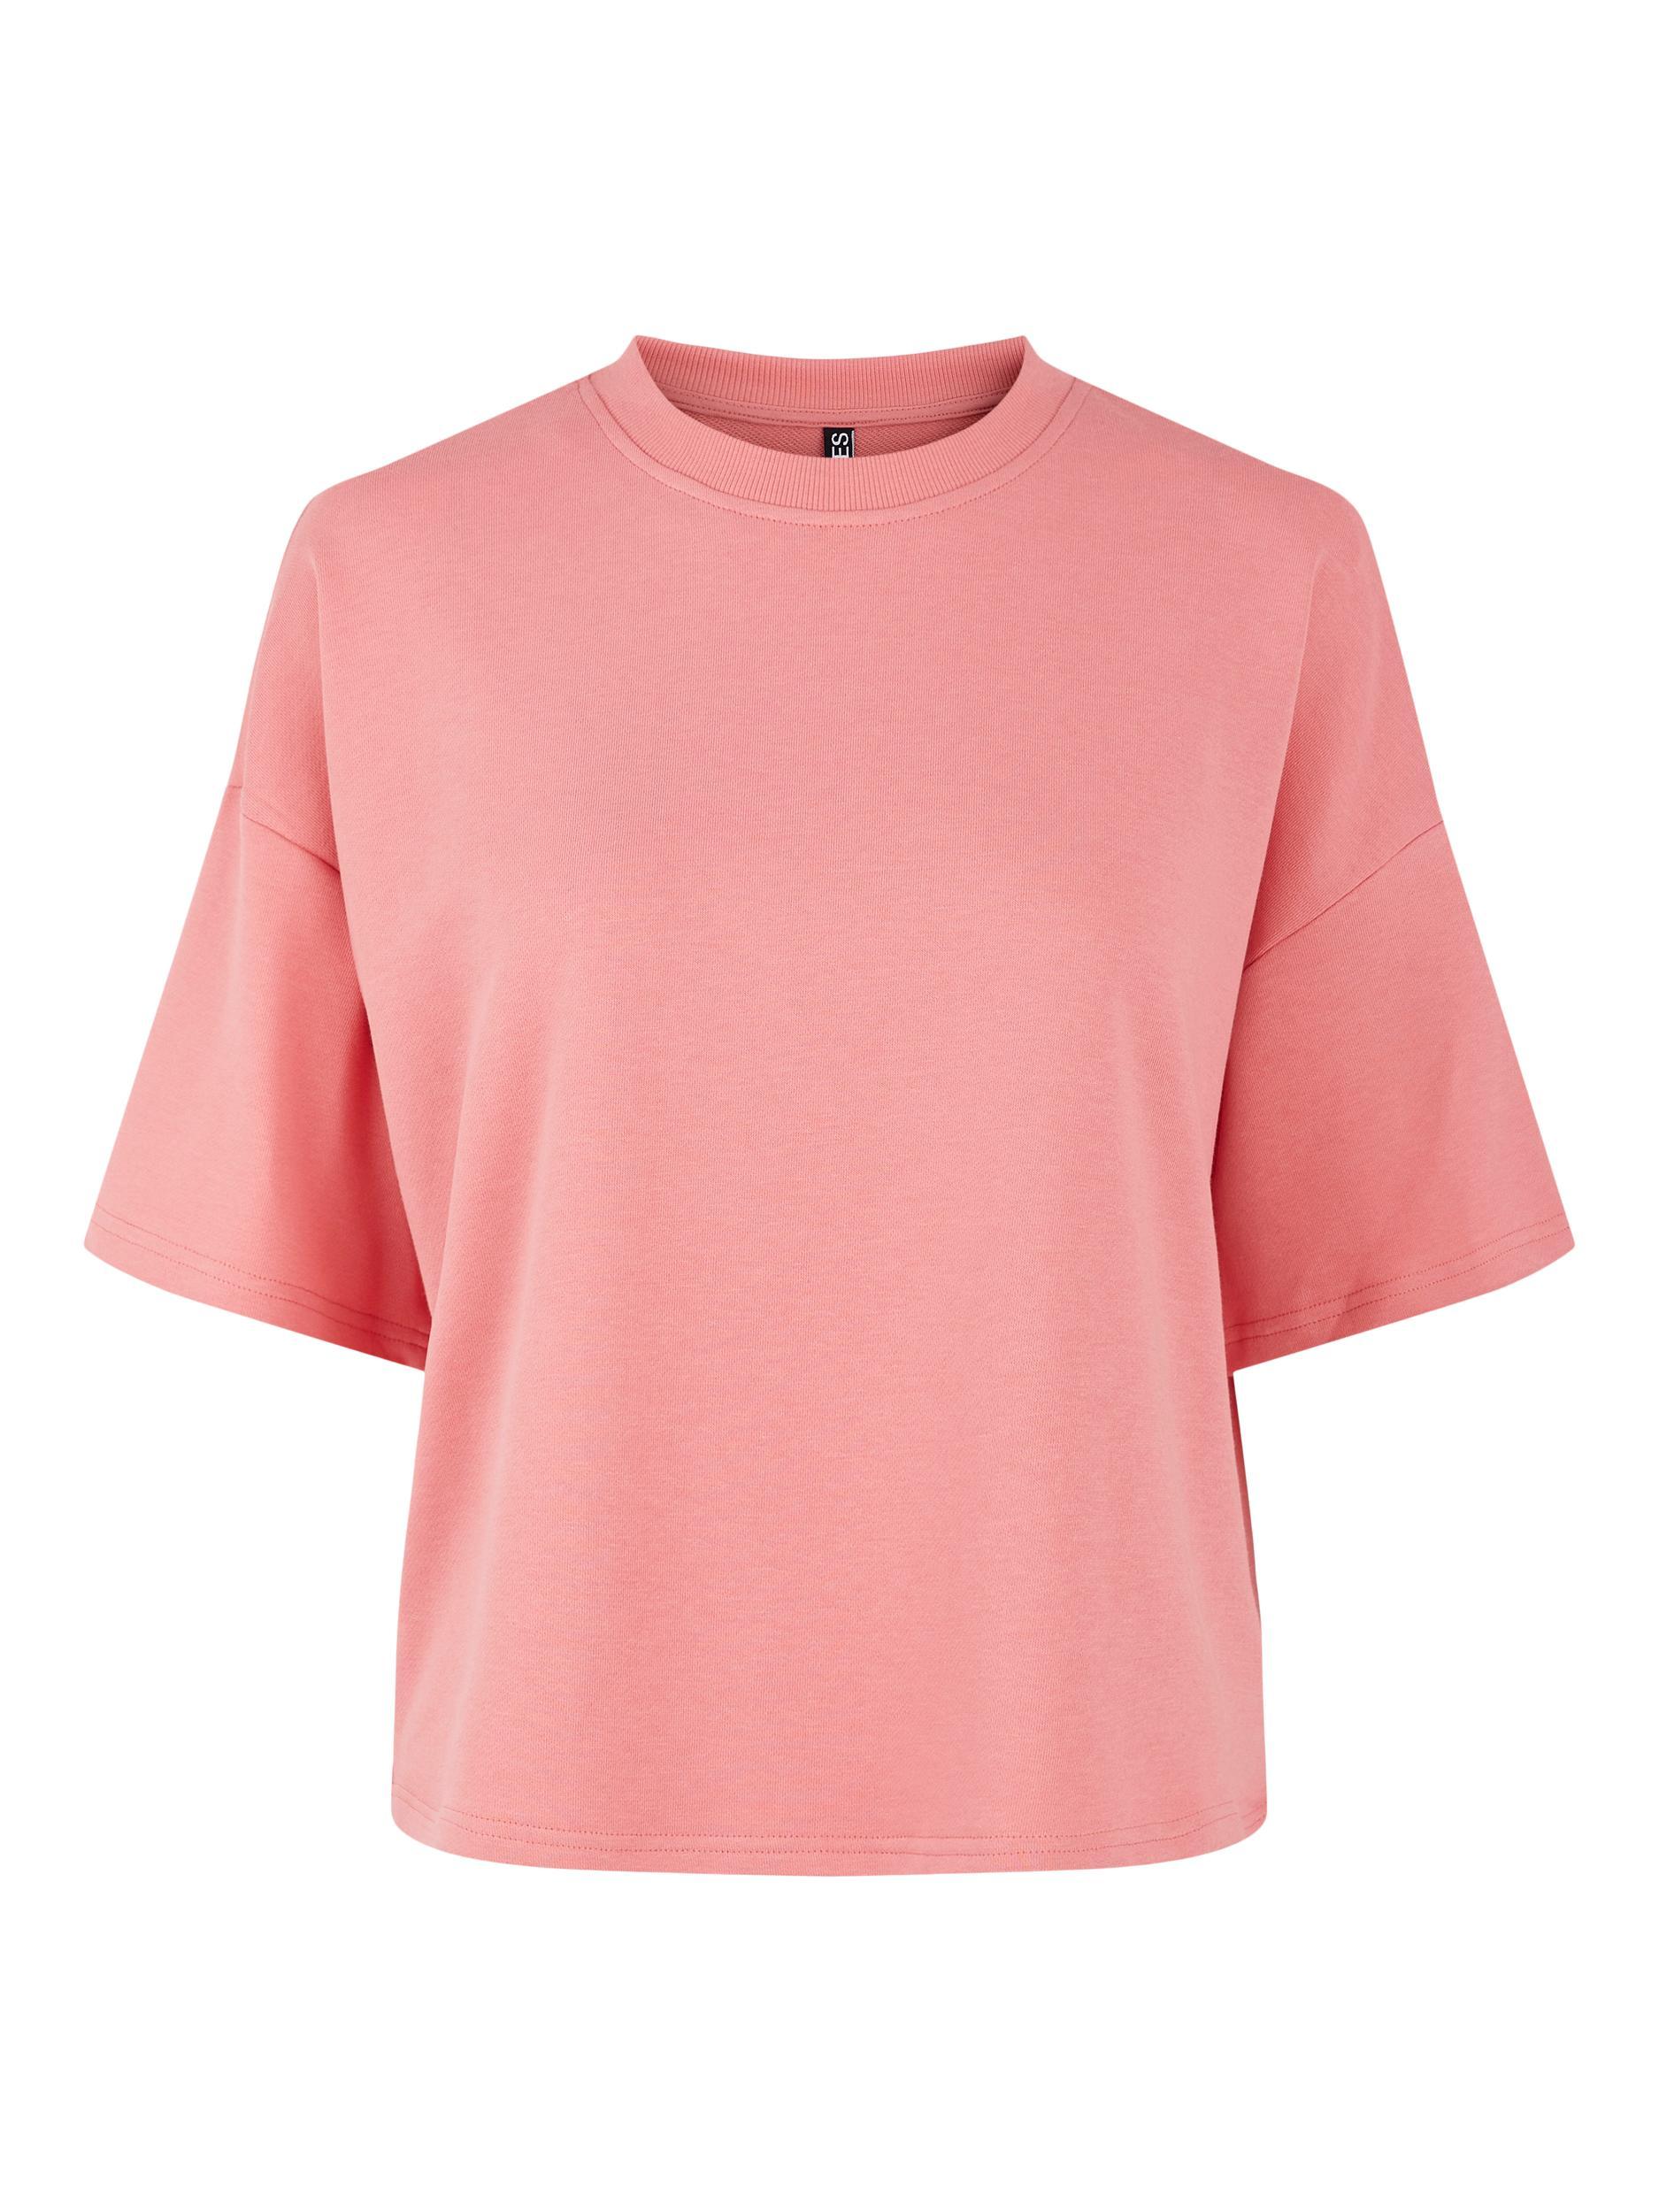 Pieces Chilli Summer t-shirt, tea rose, medium